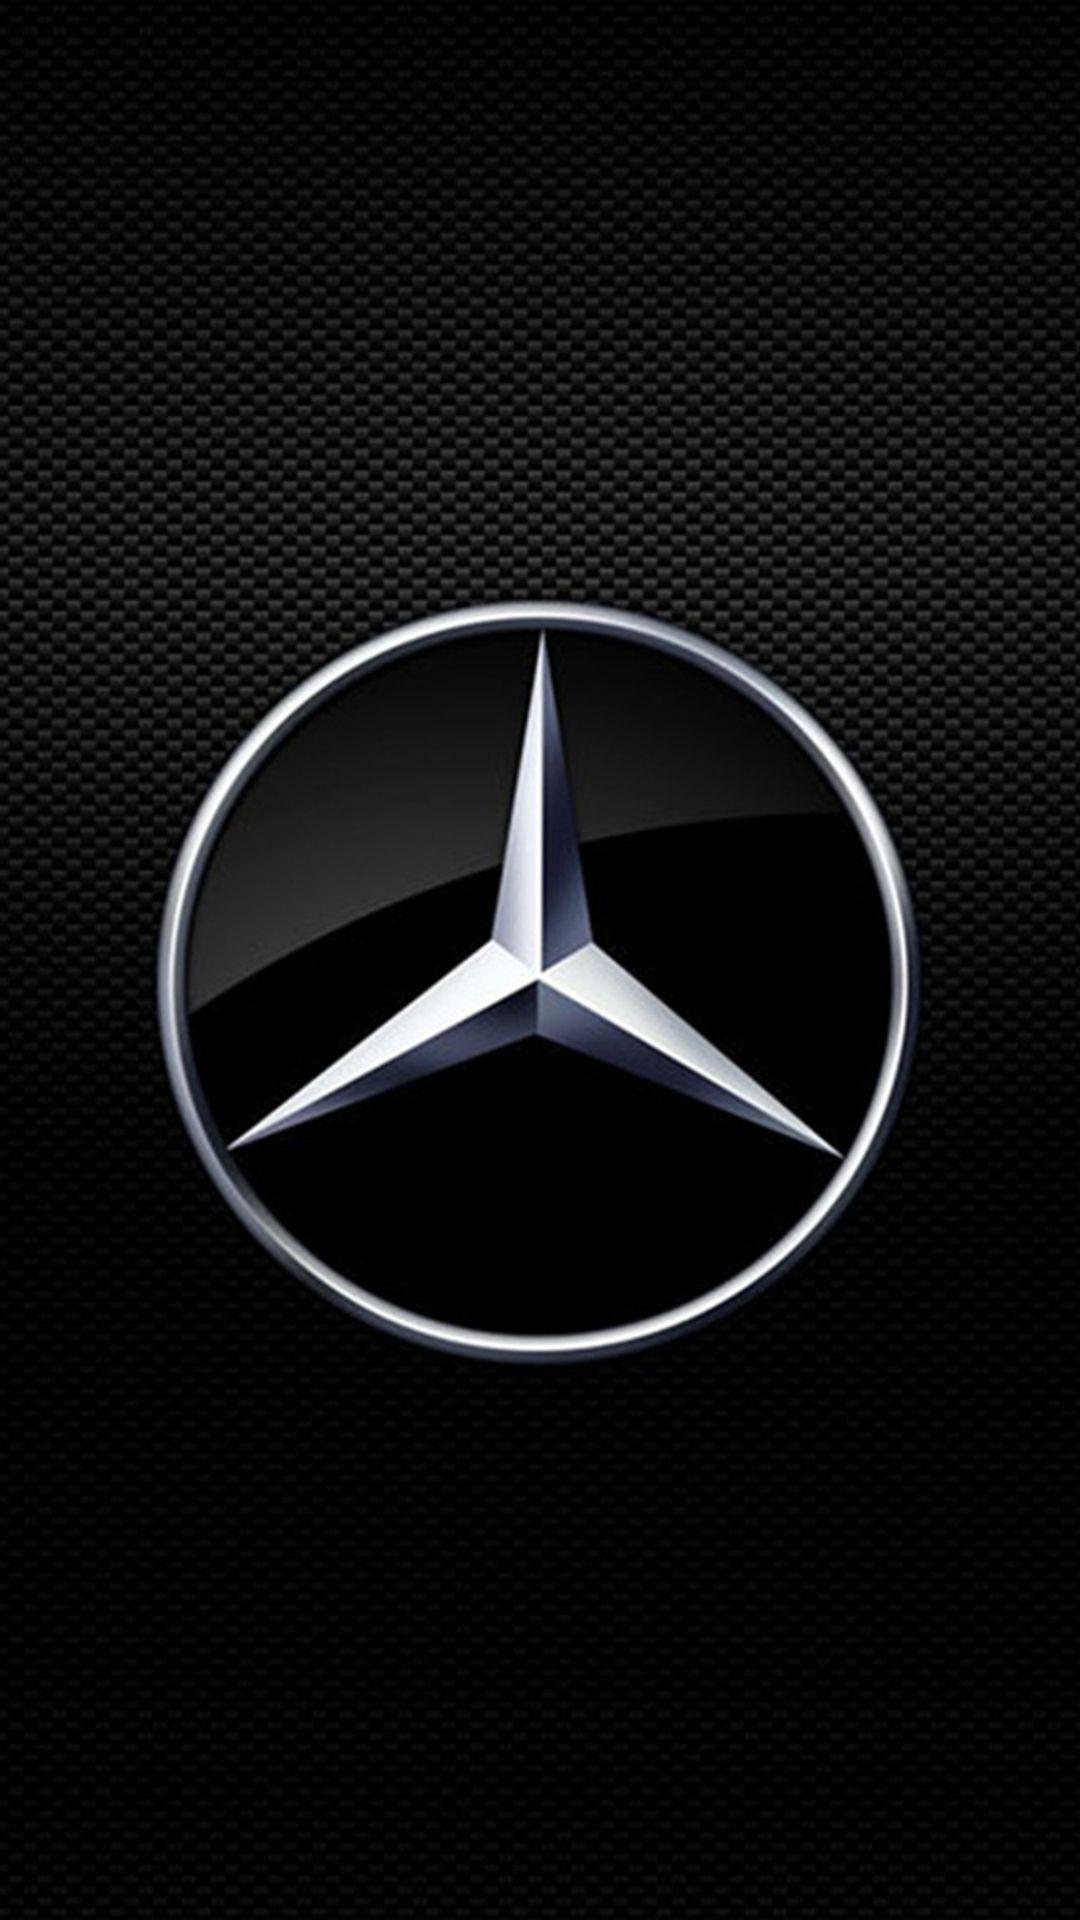 Mercedes benz symbol the ultimate symbol of quality for Mercedes benz car logo